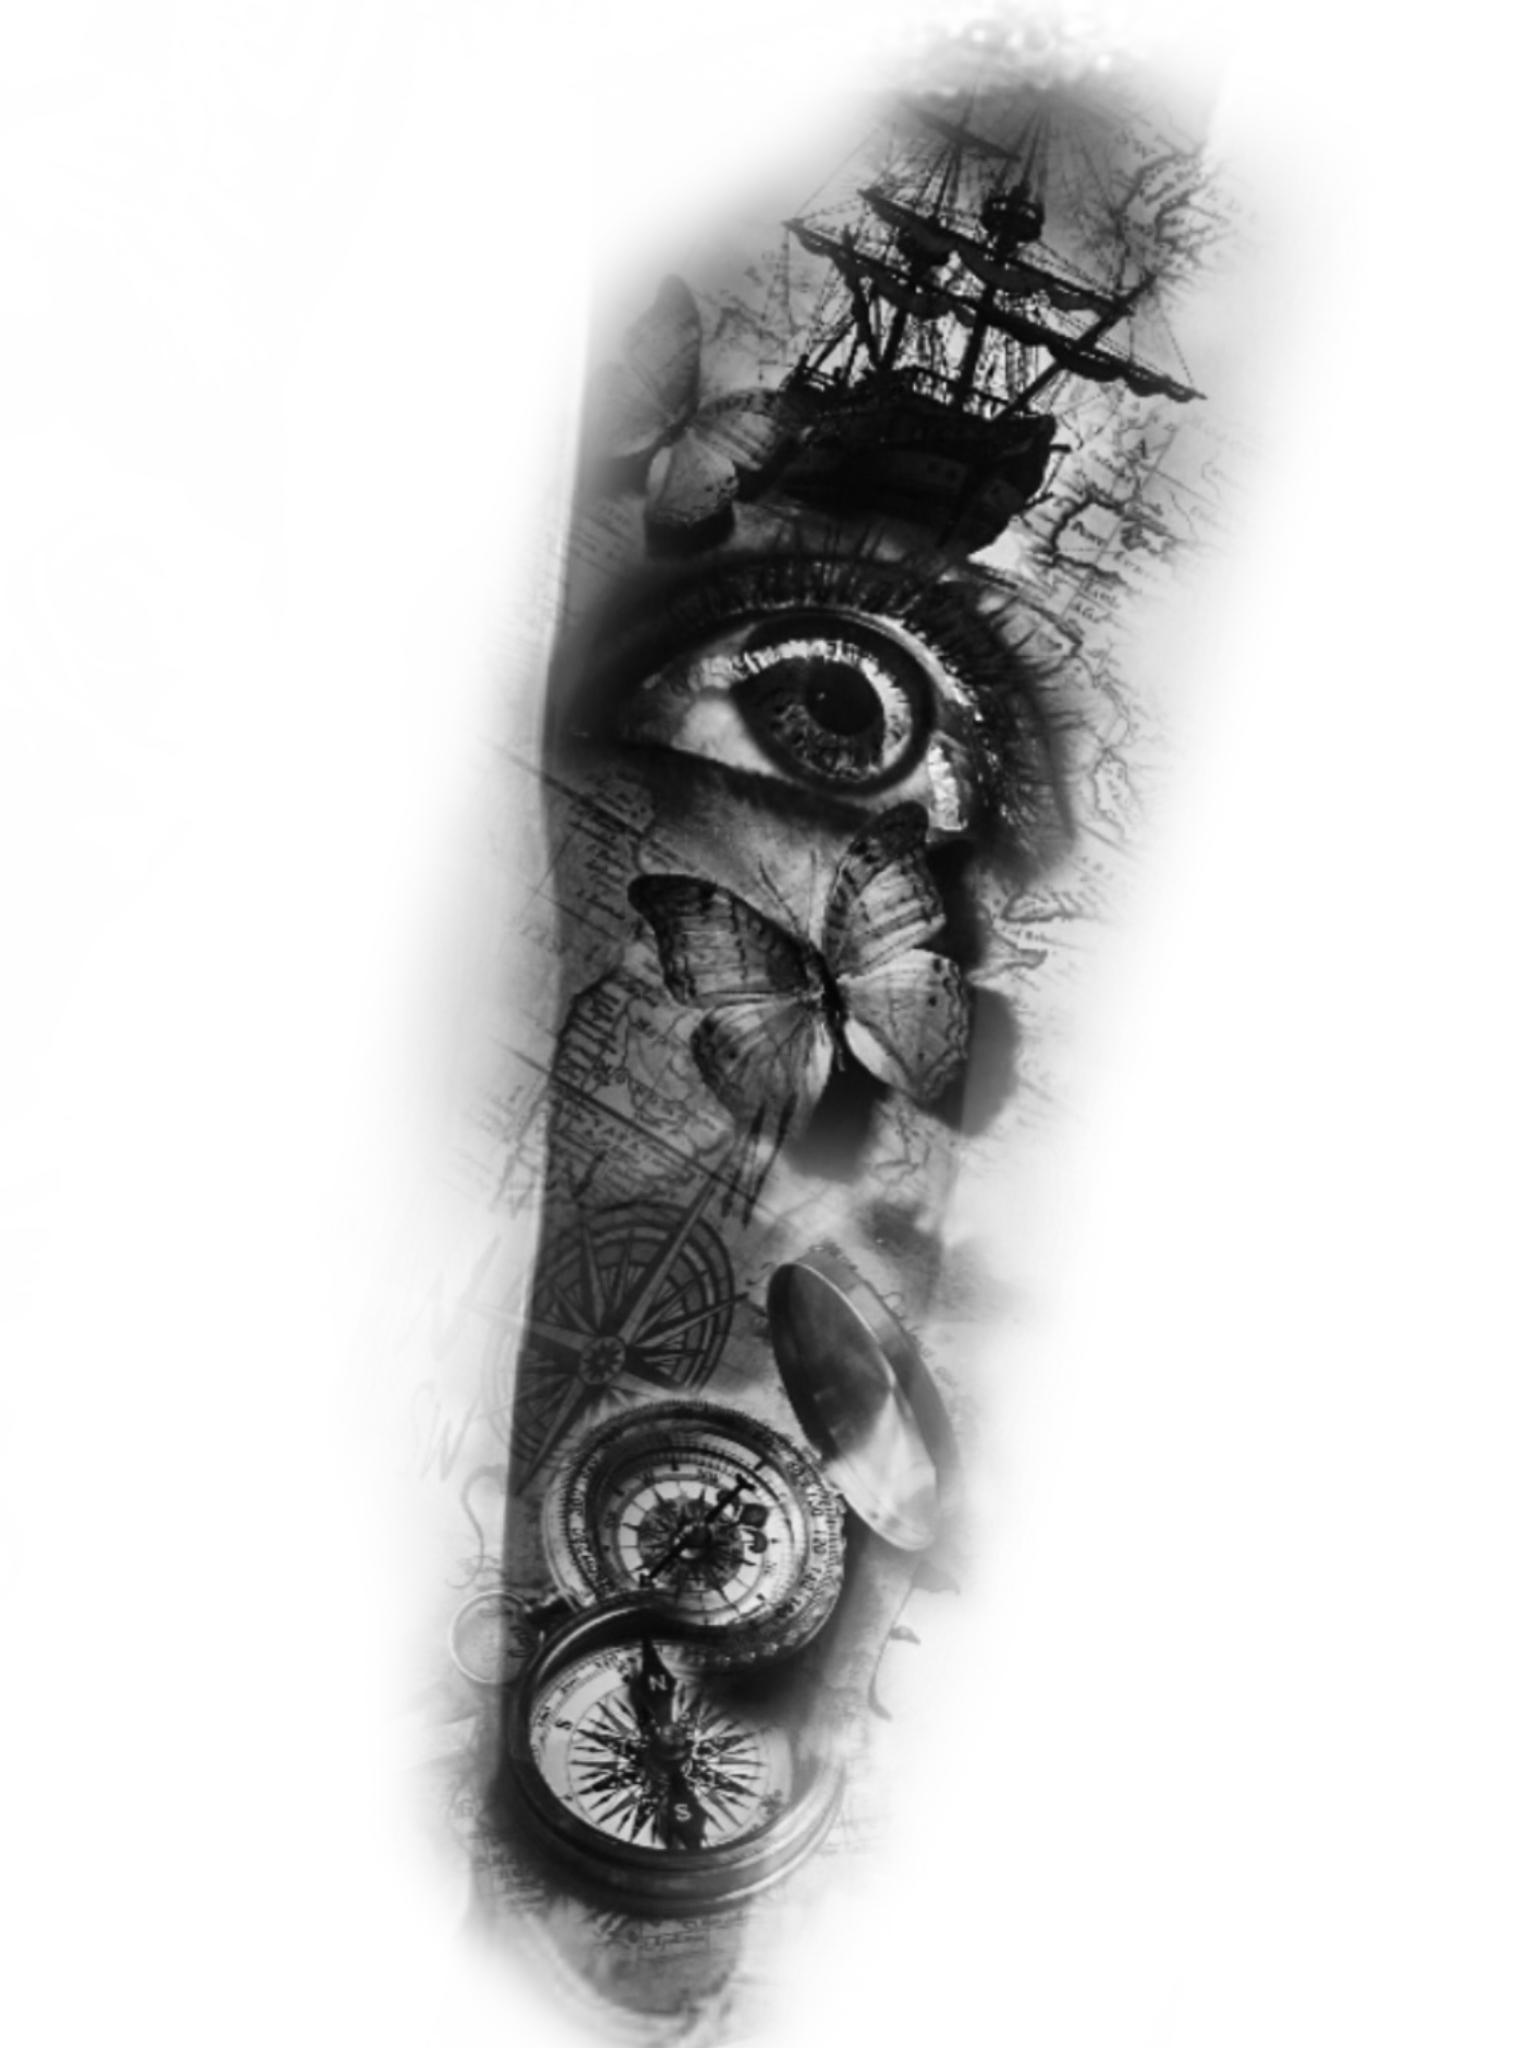 Black and white tattoo ideas pin by xăm hạ on nữ châu âu  pinterest  tattoos tattoo designs